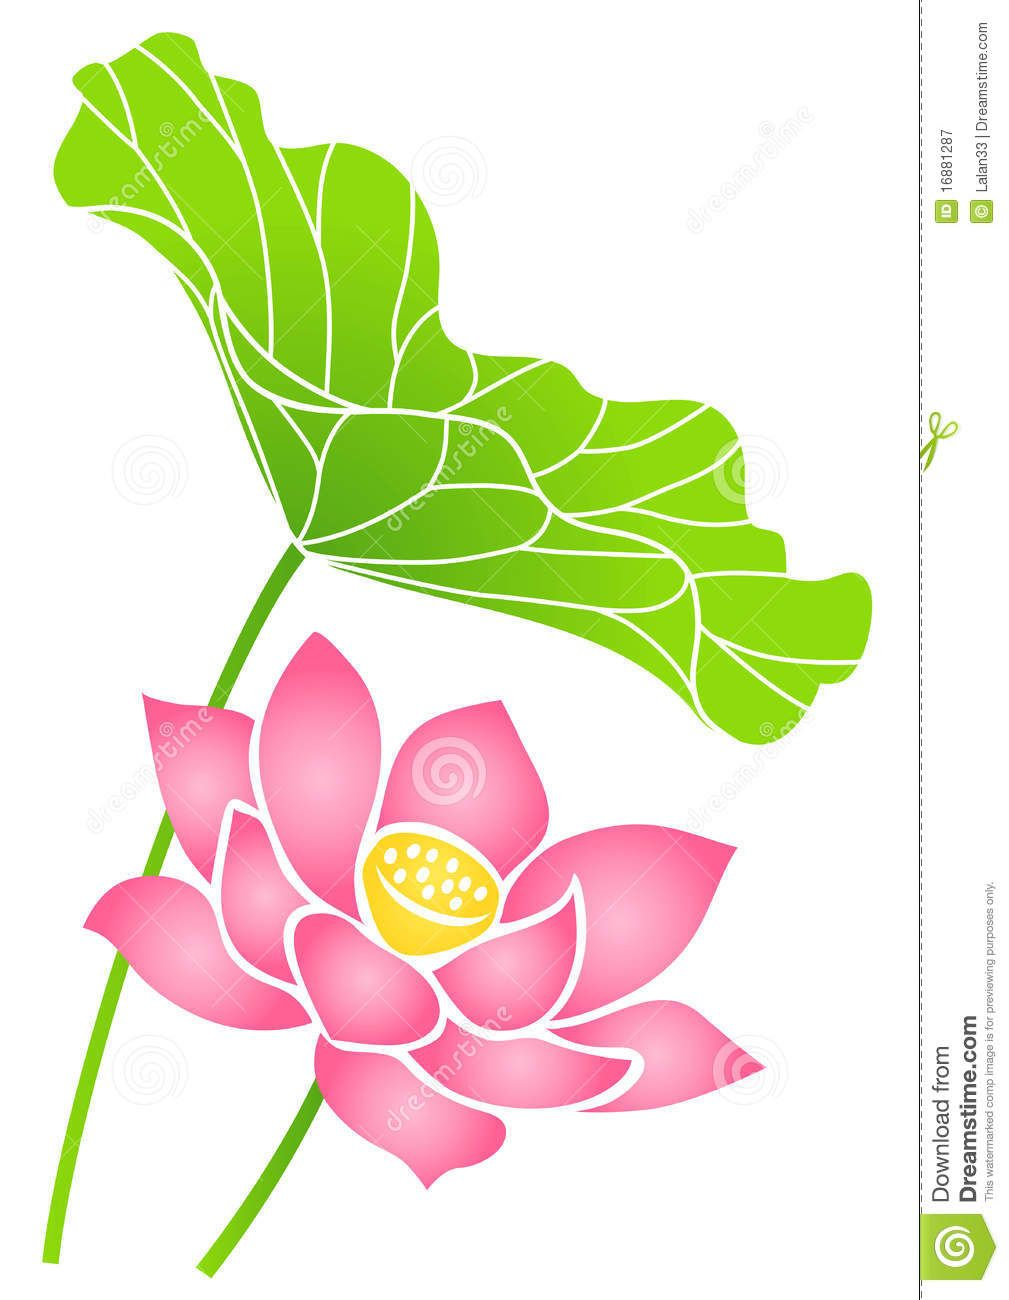 Free lotus vector art 3672 free downloads lotus flower vector art free lotus vector art 3672 free downloads lotus flower vector art free lotus flower vector mightylinksfo Choice Image